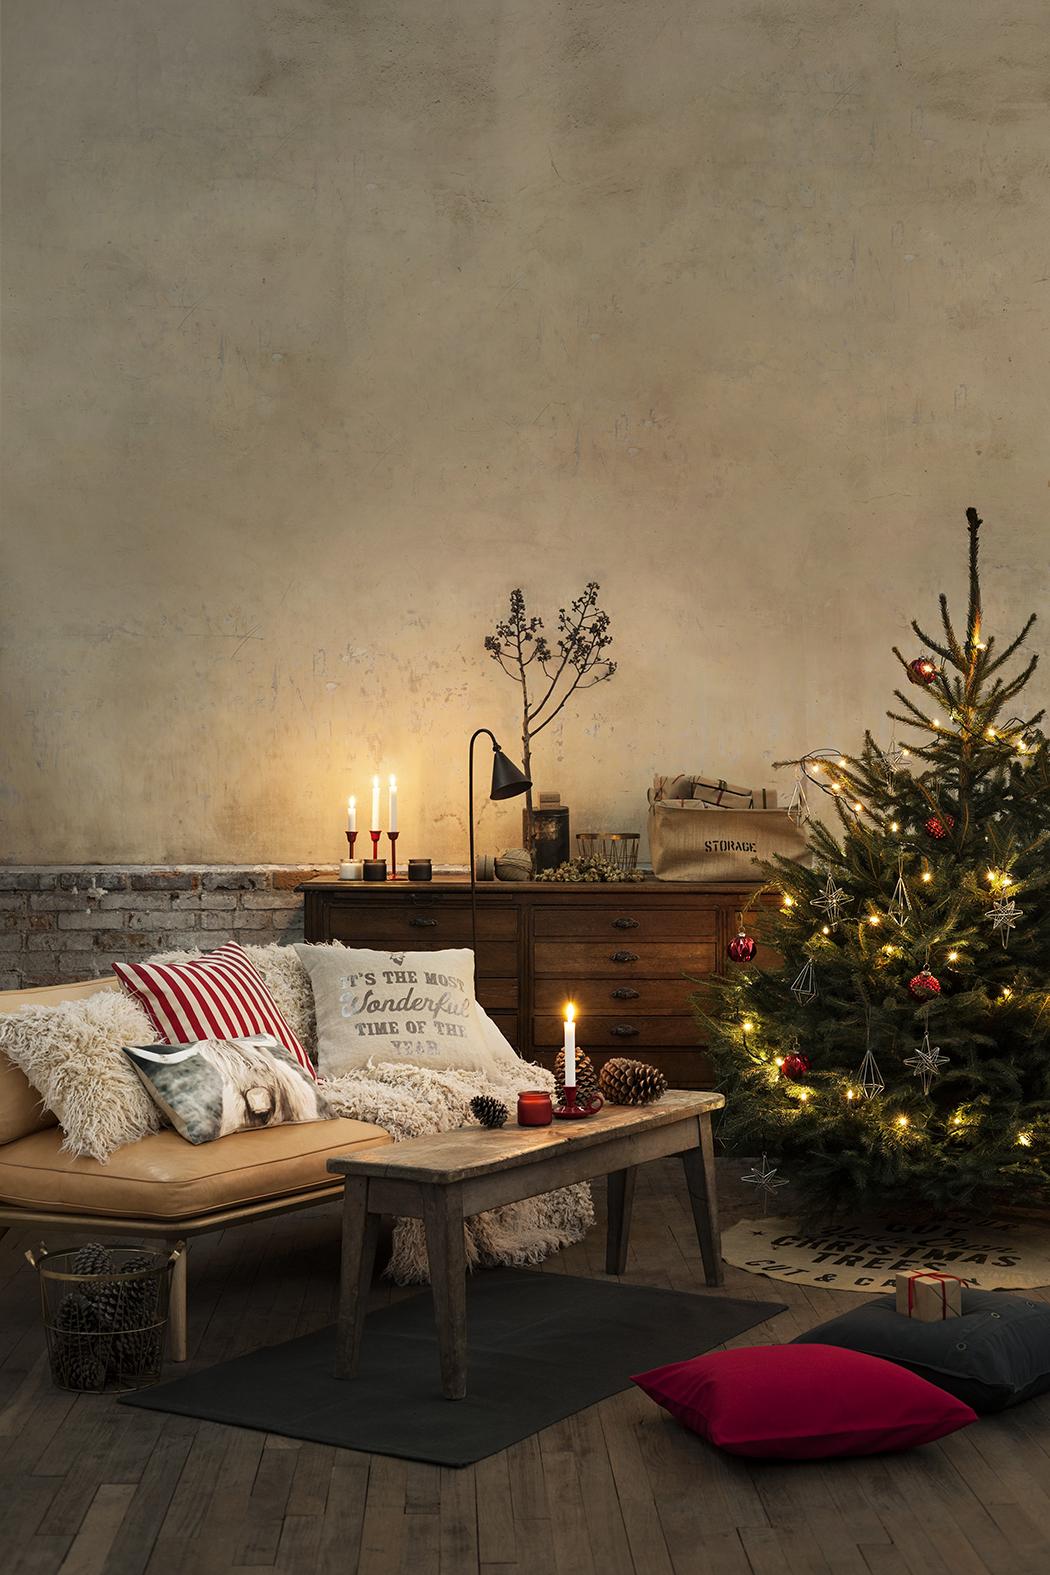 #AA8F21 Living By Miriam: Naturliga Juldekorationer 6029 decoration de noel rustique 1050x1575 px @ aertt.com